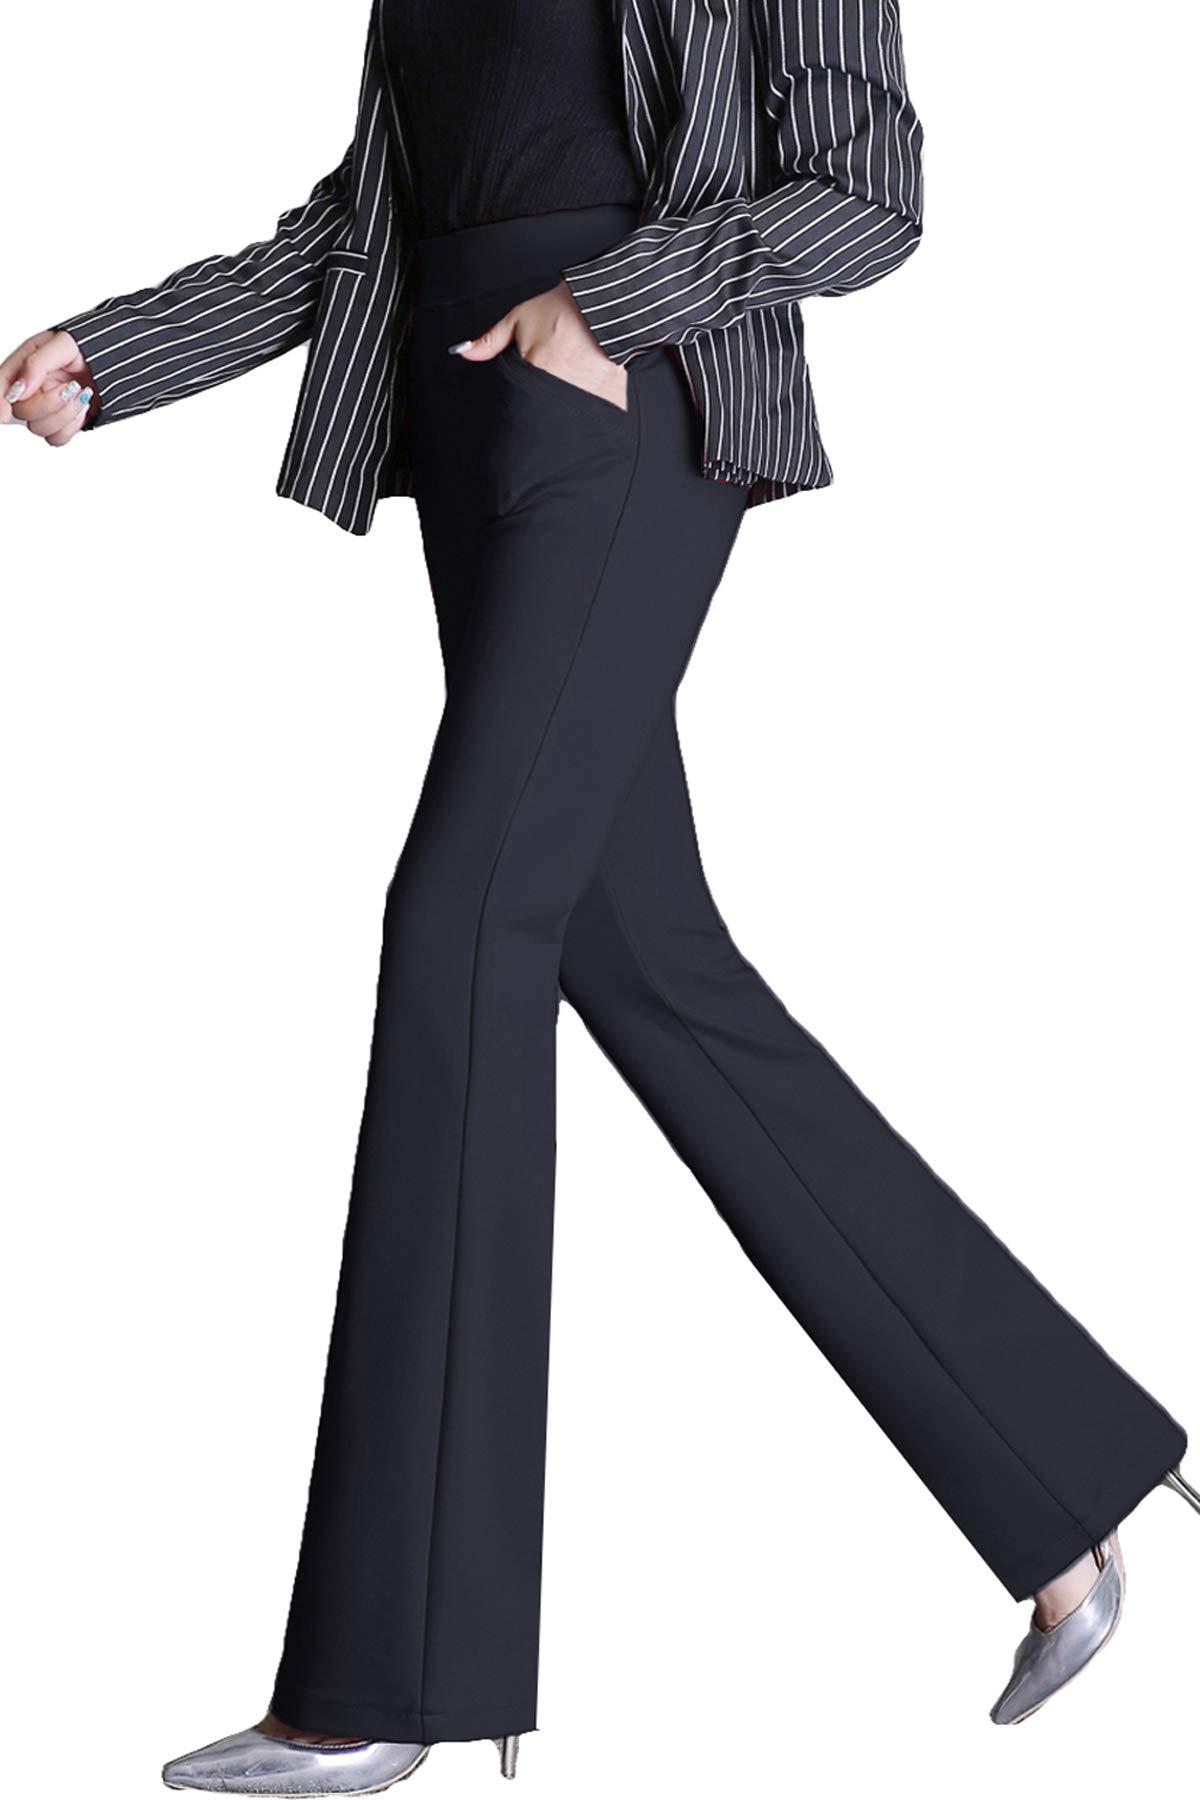 MYIFU Womens Yoga Dress Pants Bootcut with Pockets High Waist Tummy Contorl Slim Stretch Bootleg Work Slacks…